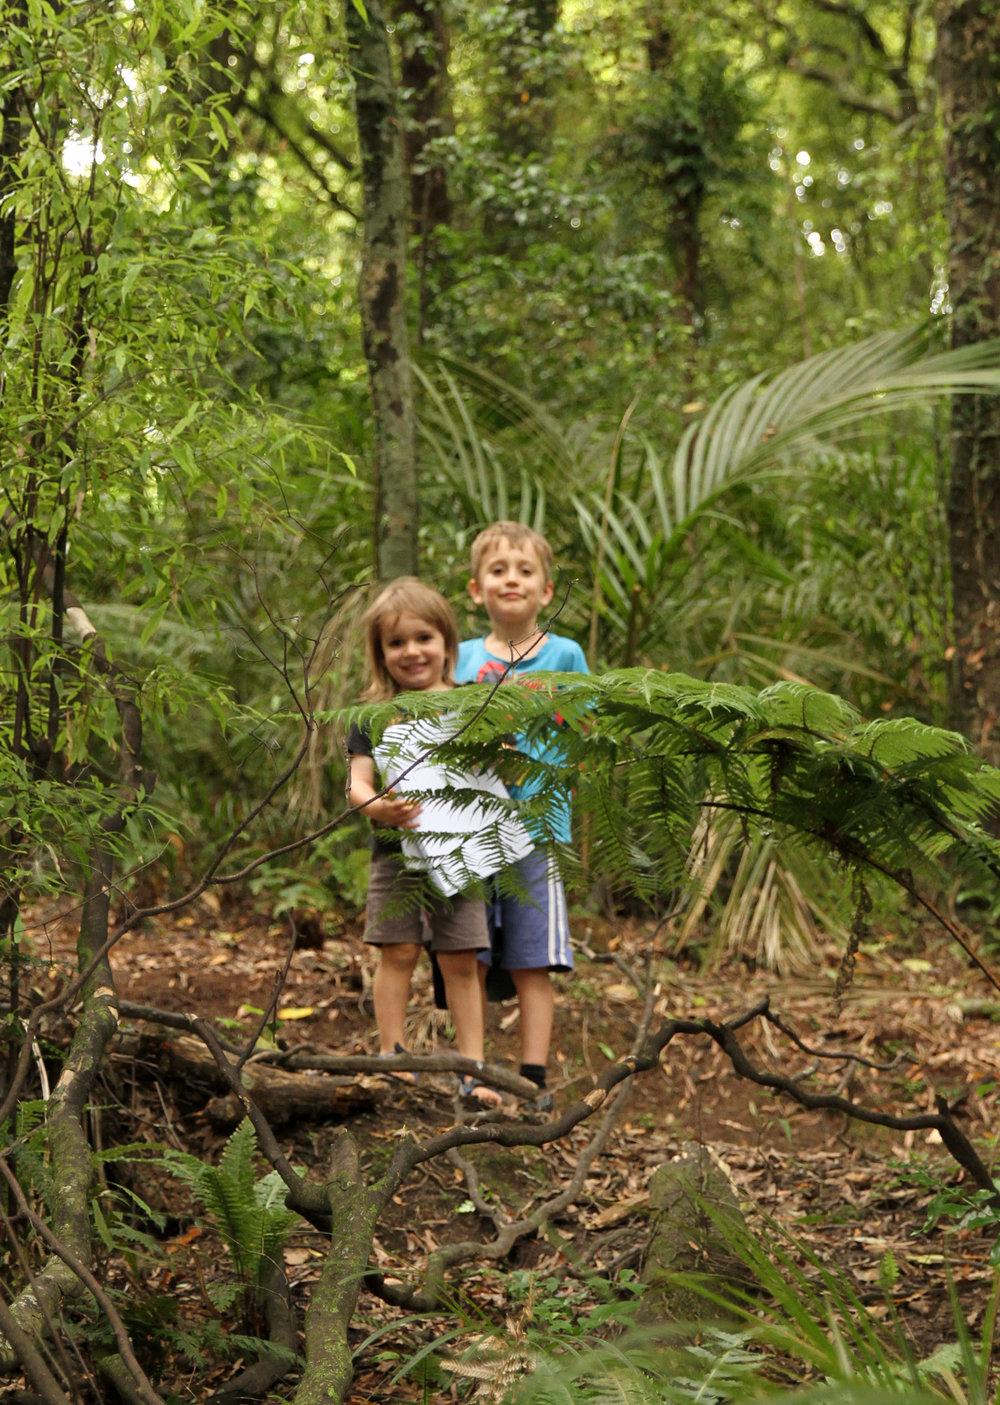 2 young kiwi rangers in the Manawatu Gorge